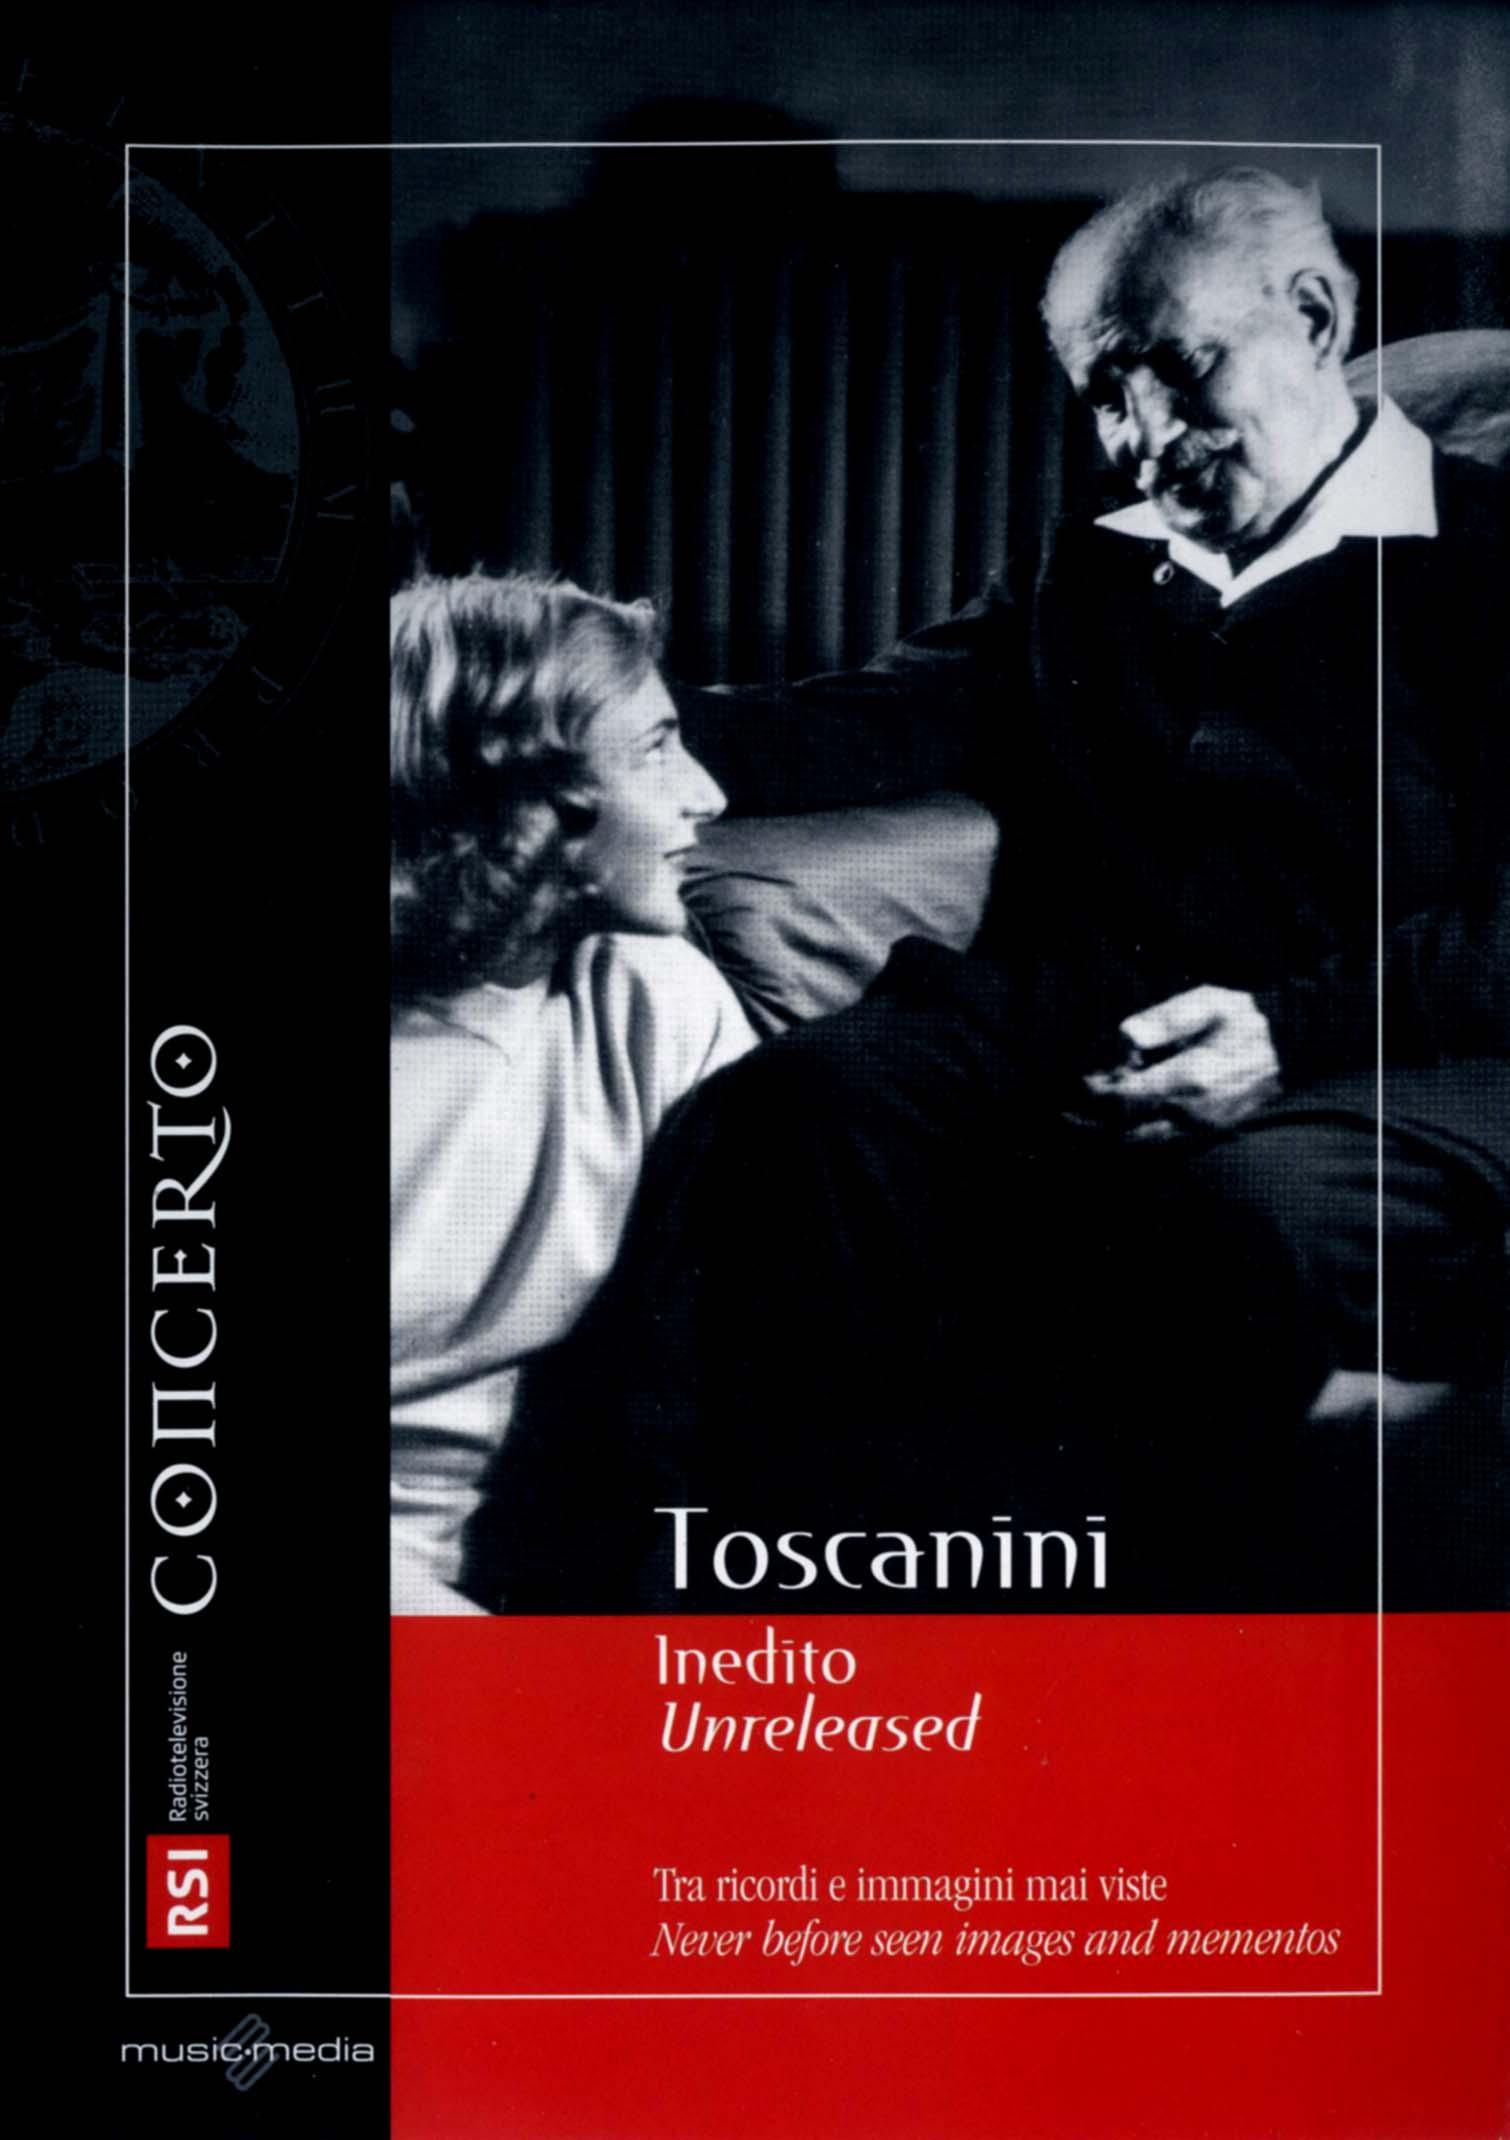 Toscanini: Unreleased